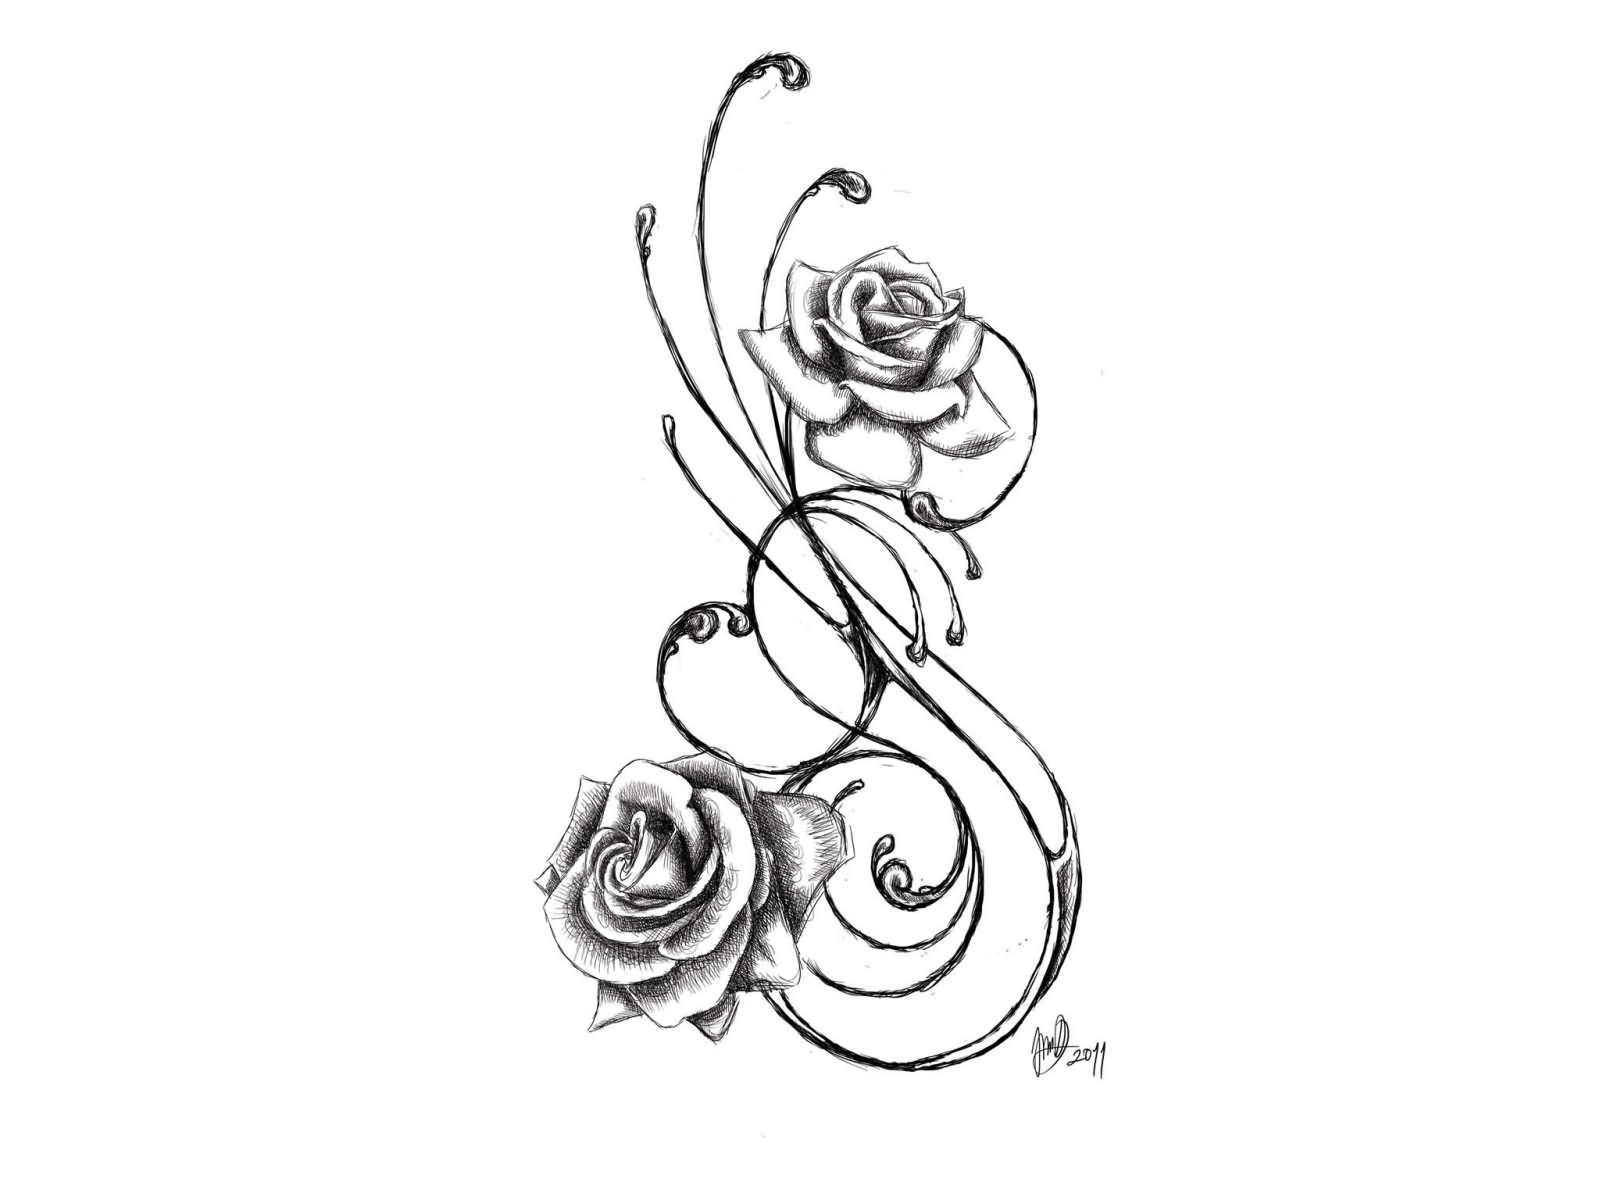 d0cbe92d1e63b 1600x1200 Best Ideas Of Tribal Roses Tattoo Designs Photos Pictures